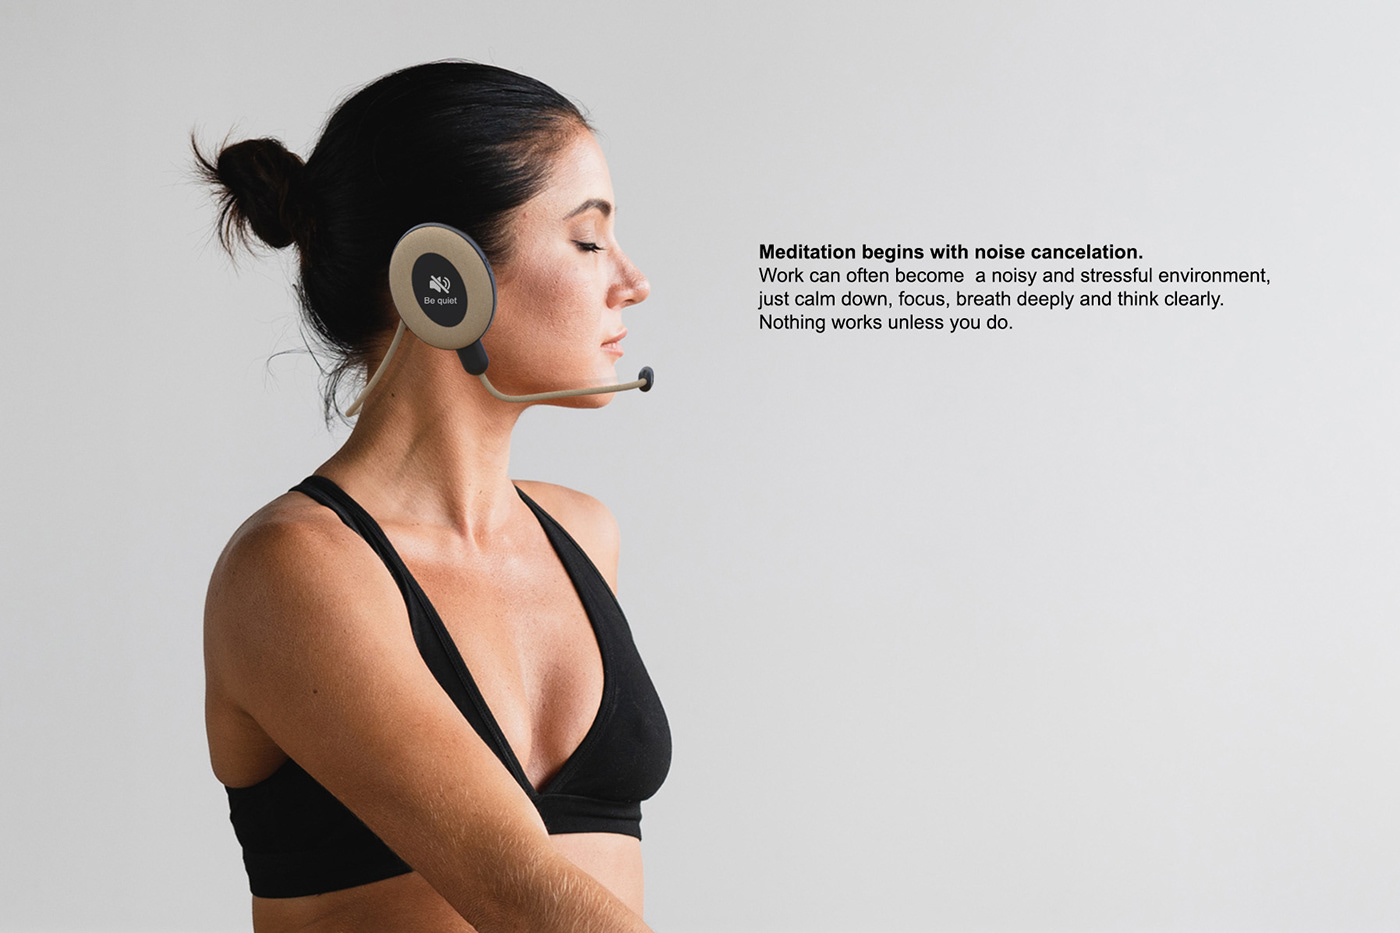 darko nikolic Glasom headphones headset Innovative minimalist Smart headset tech Wearable